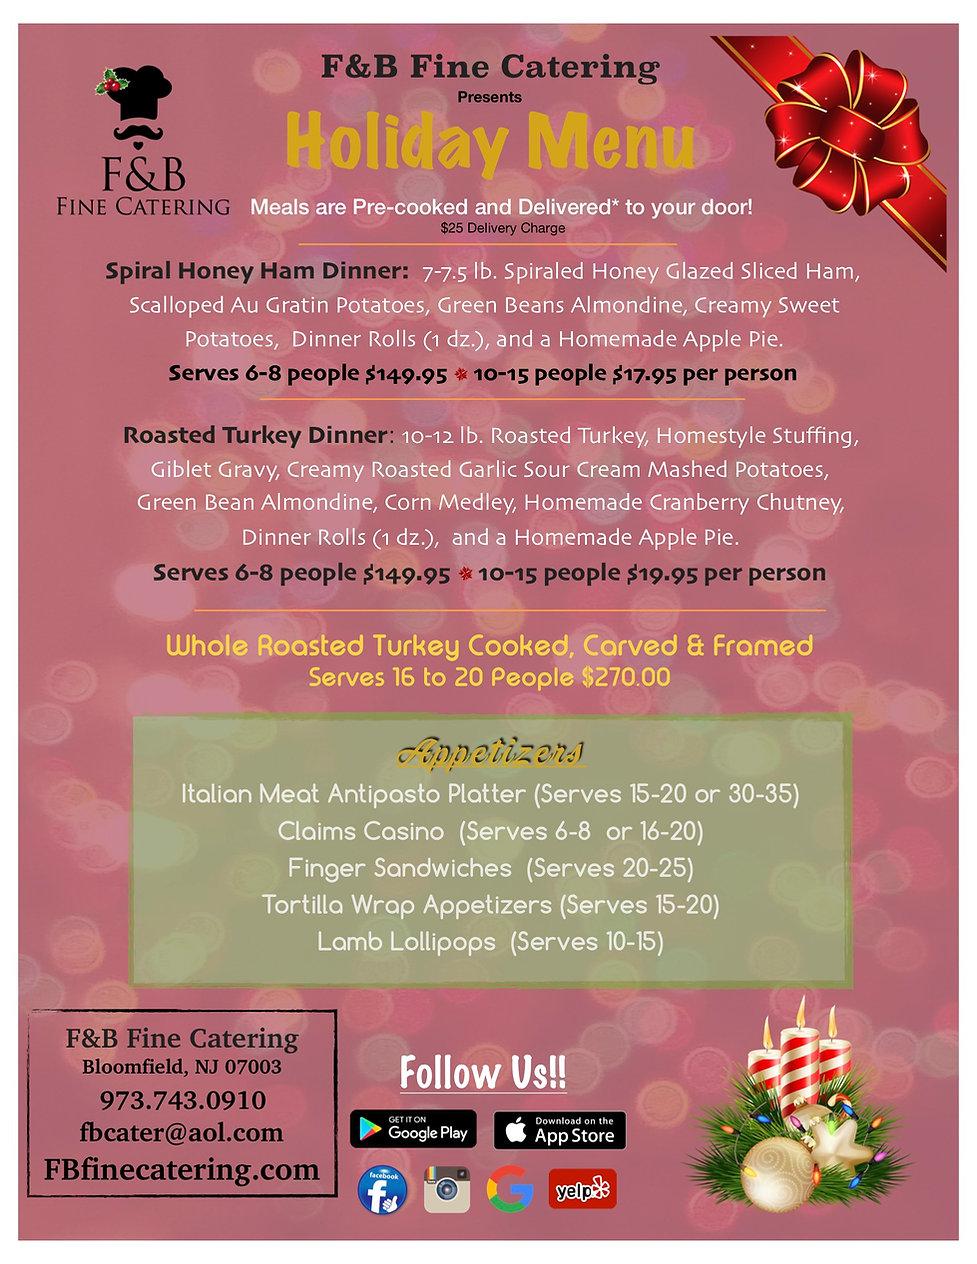 Holiday Menu 01-Christmas Flyer 2019.jpg